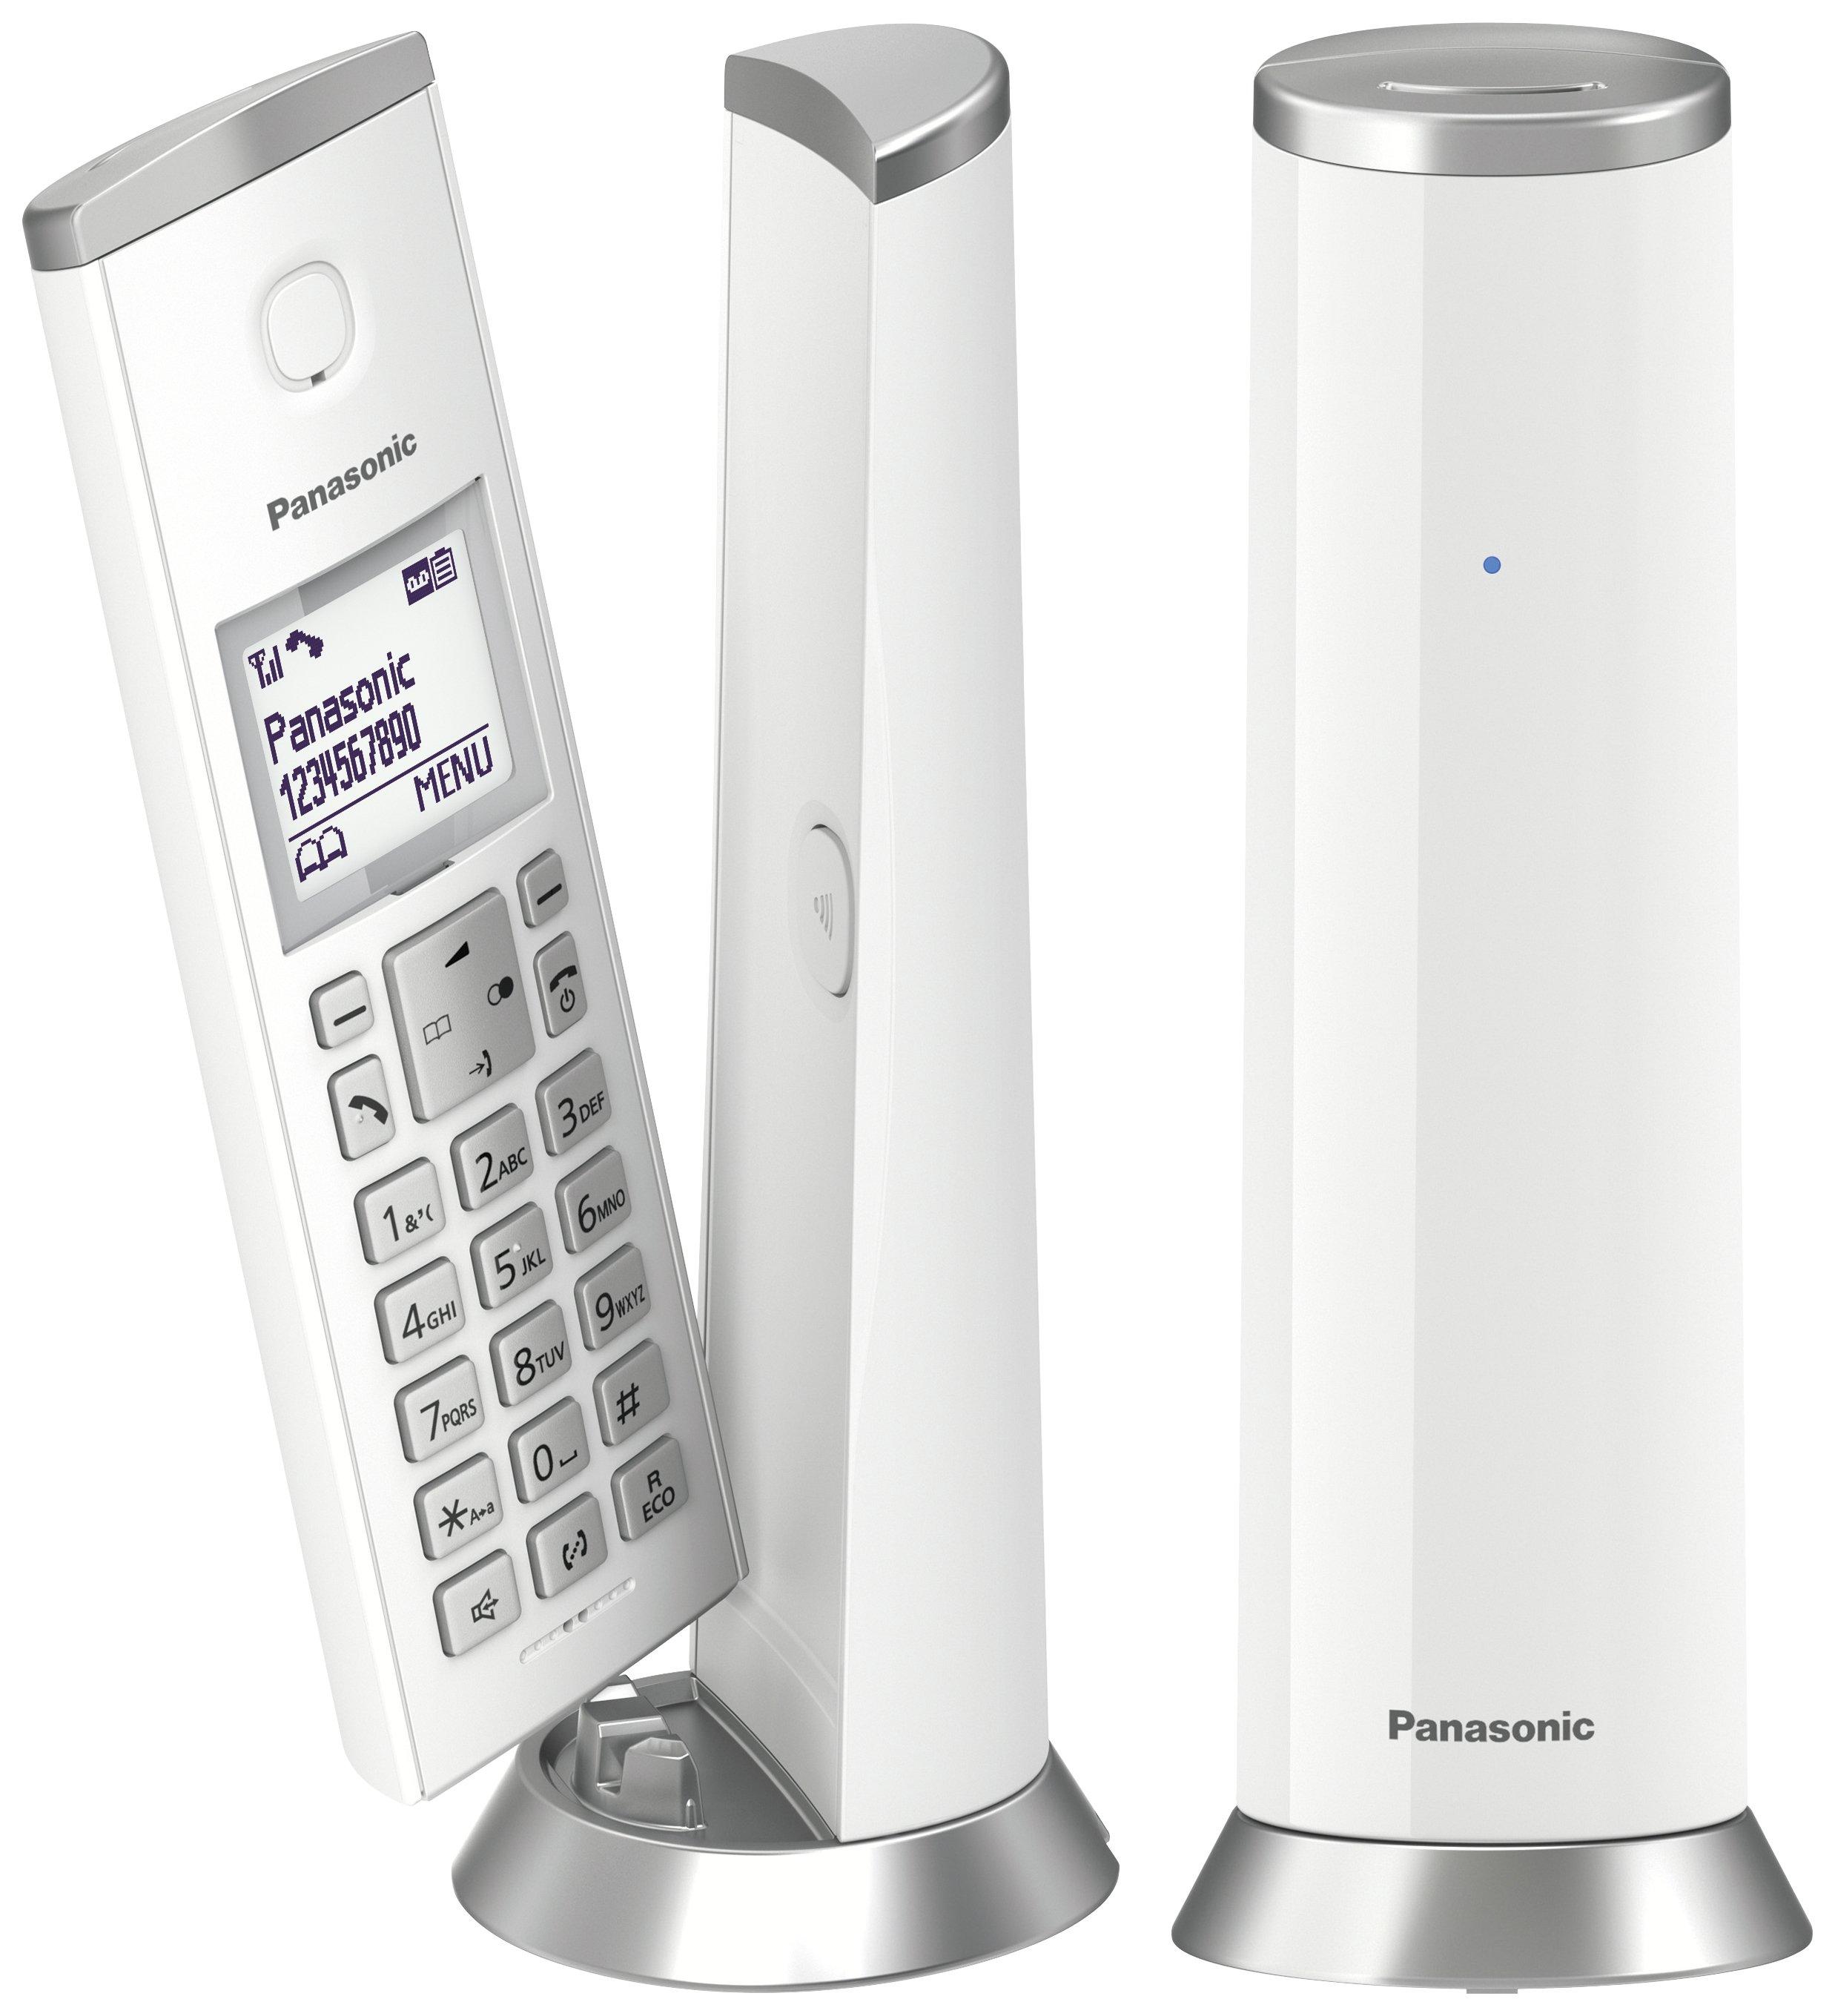 panasonic-cordless-telephone-answering-machine-twin